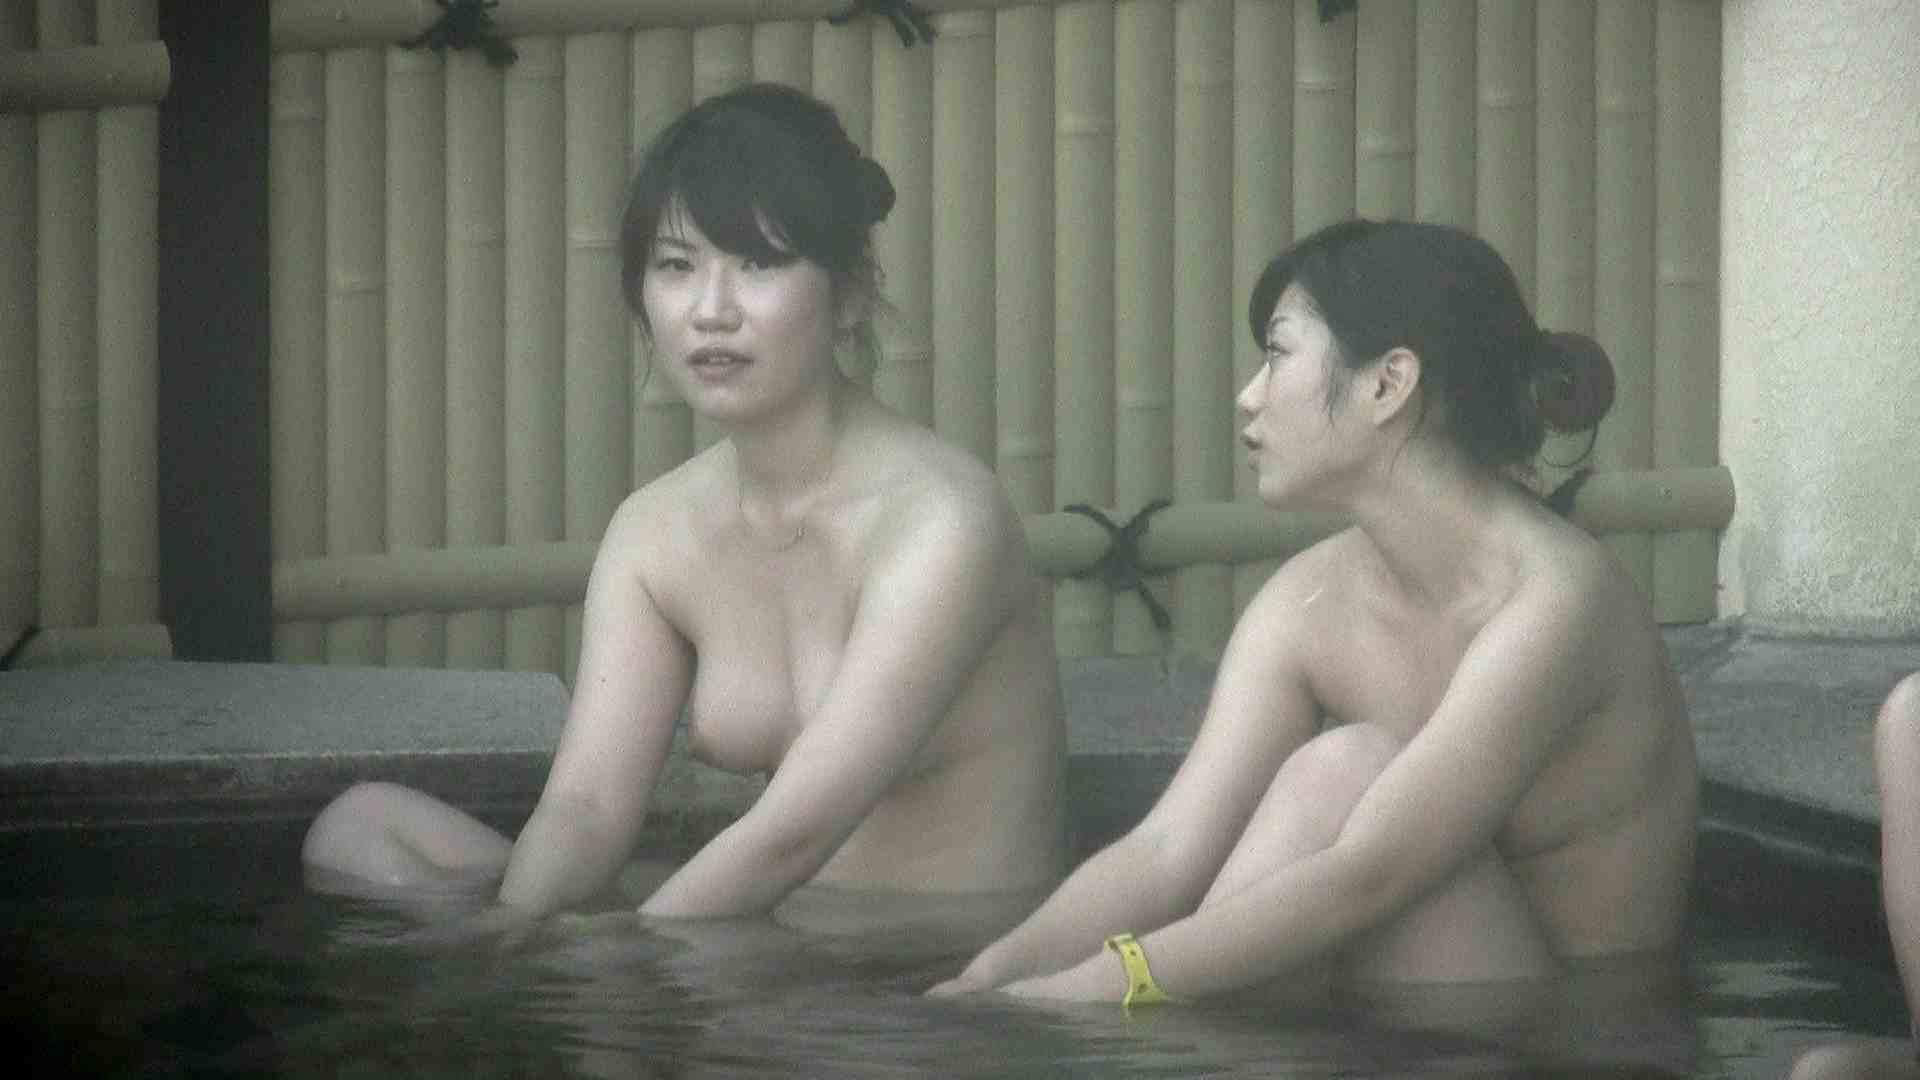 Aquaな露天風呂Vol.206 露天 | HなOL  74pic 9